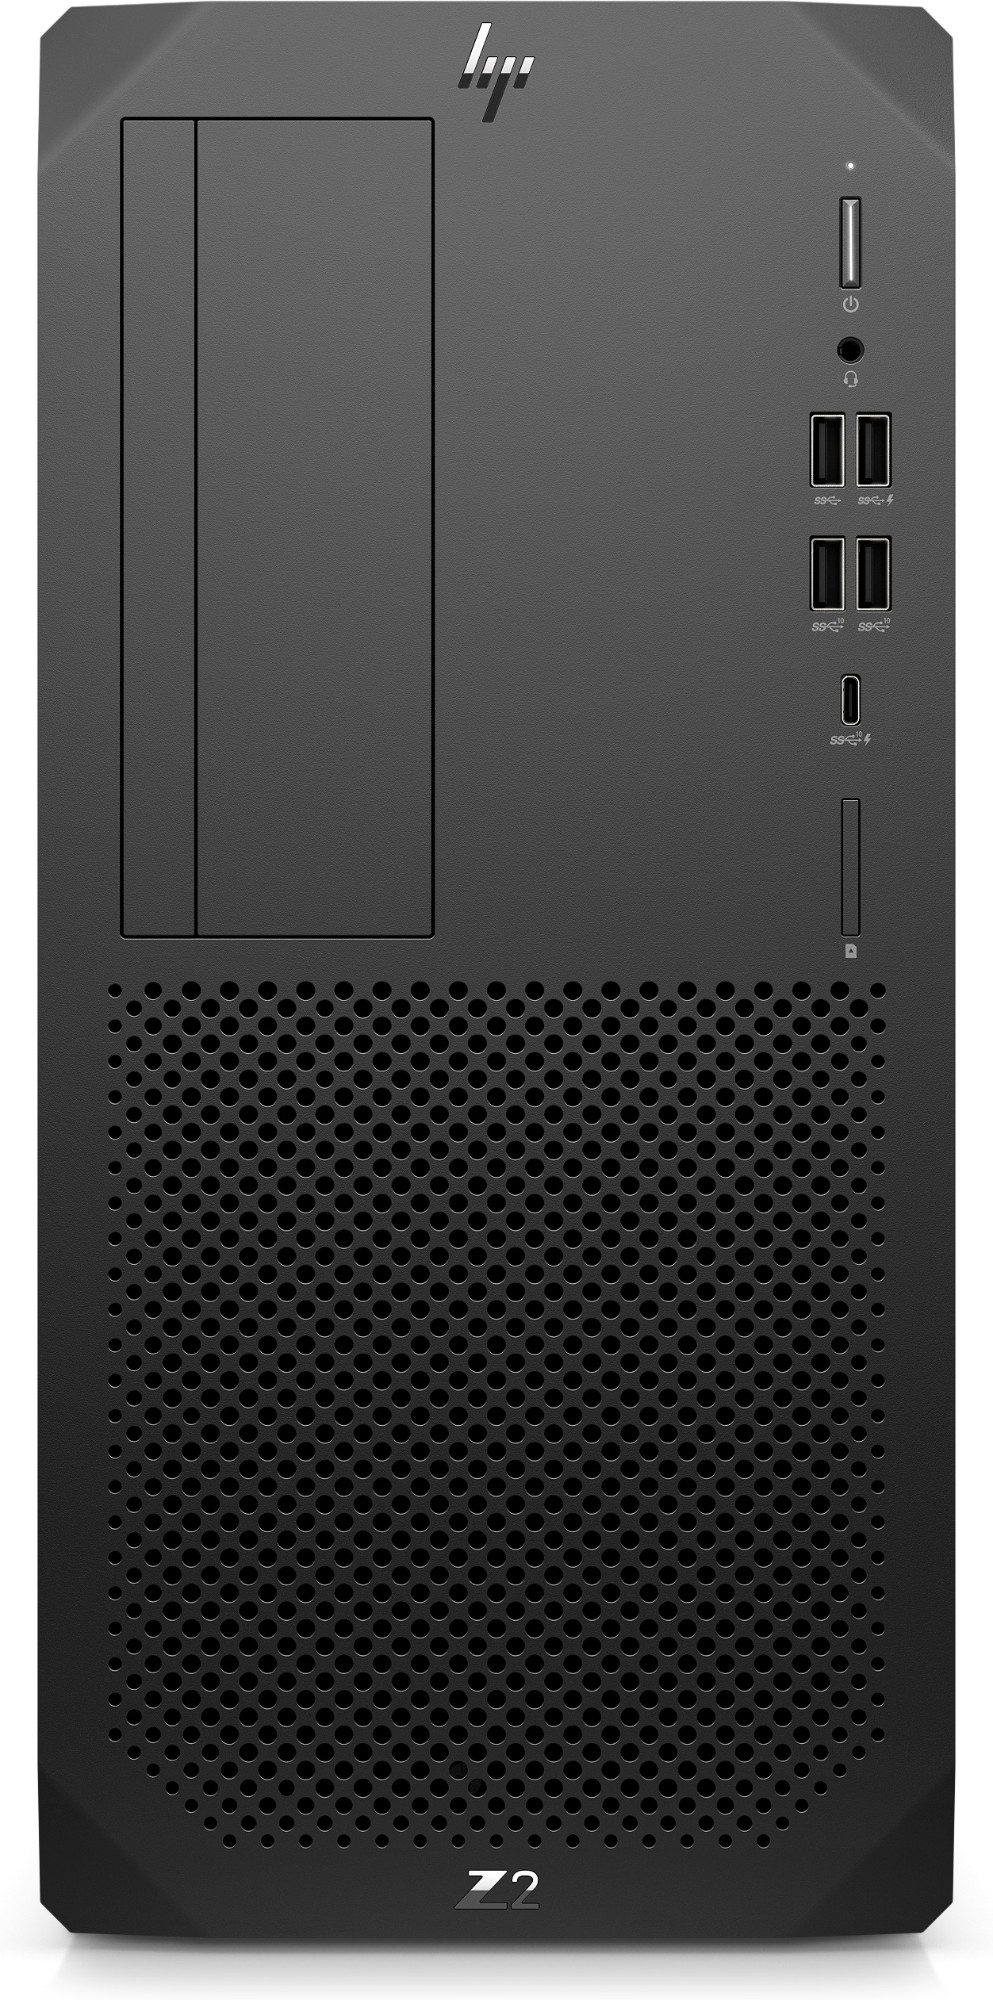 HP Z2 G5 DDR4-SDRAM i7-10700 Tower 10th gen Intel® Core™ i7 8 GB 256 GB SSD Windows 10 Pro for Workstations Workstation Black